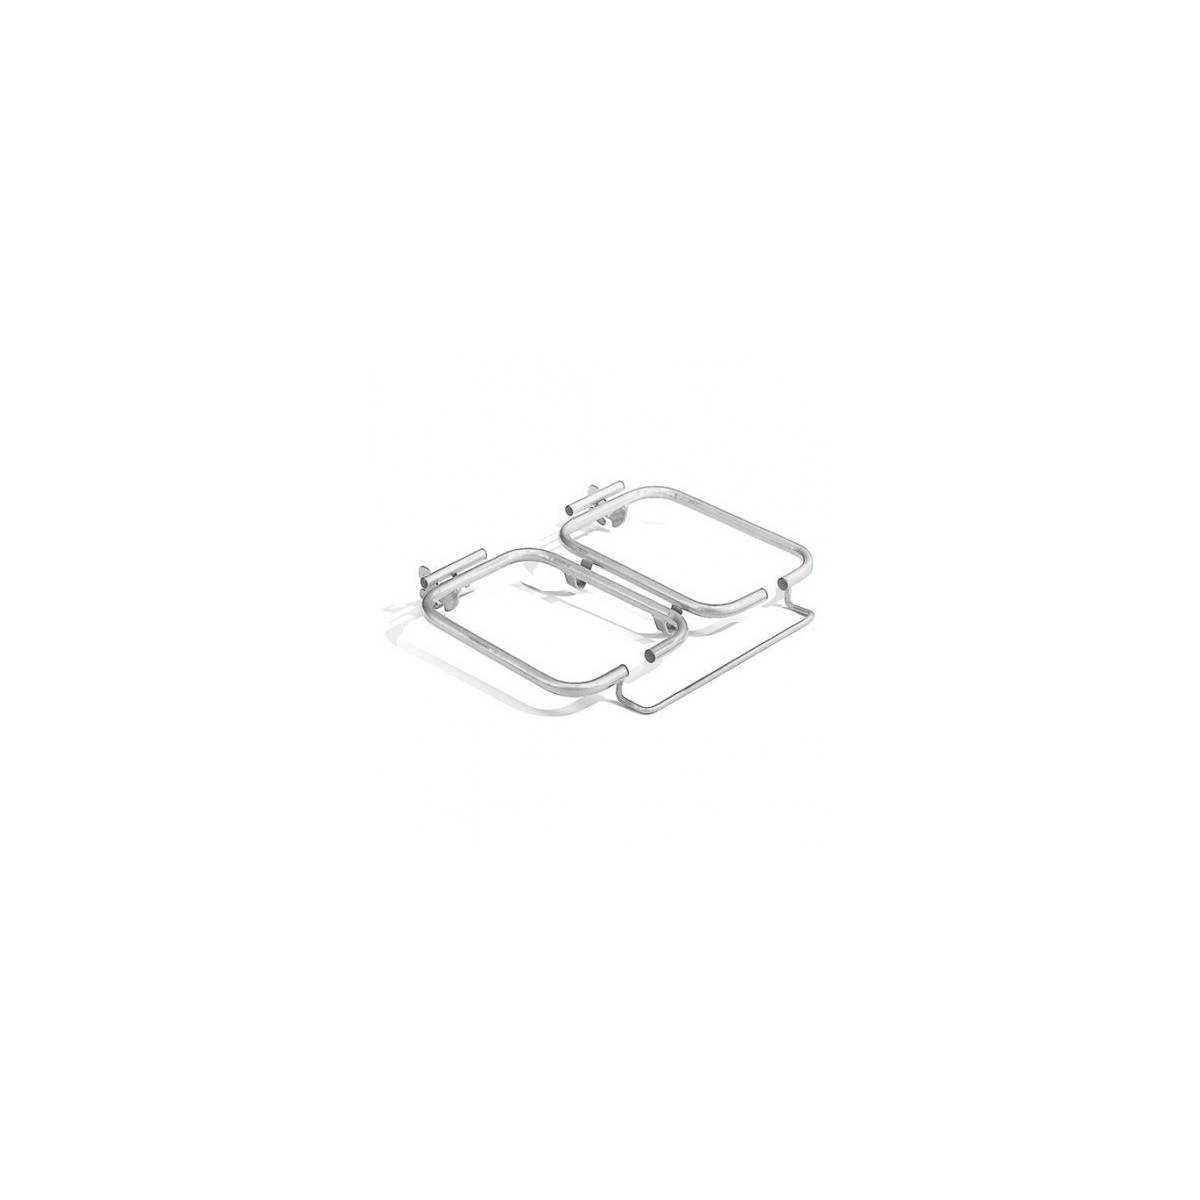 Держатель для мешков (L050202) L050202 TTS